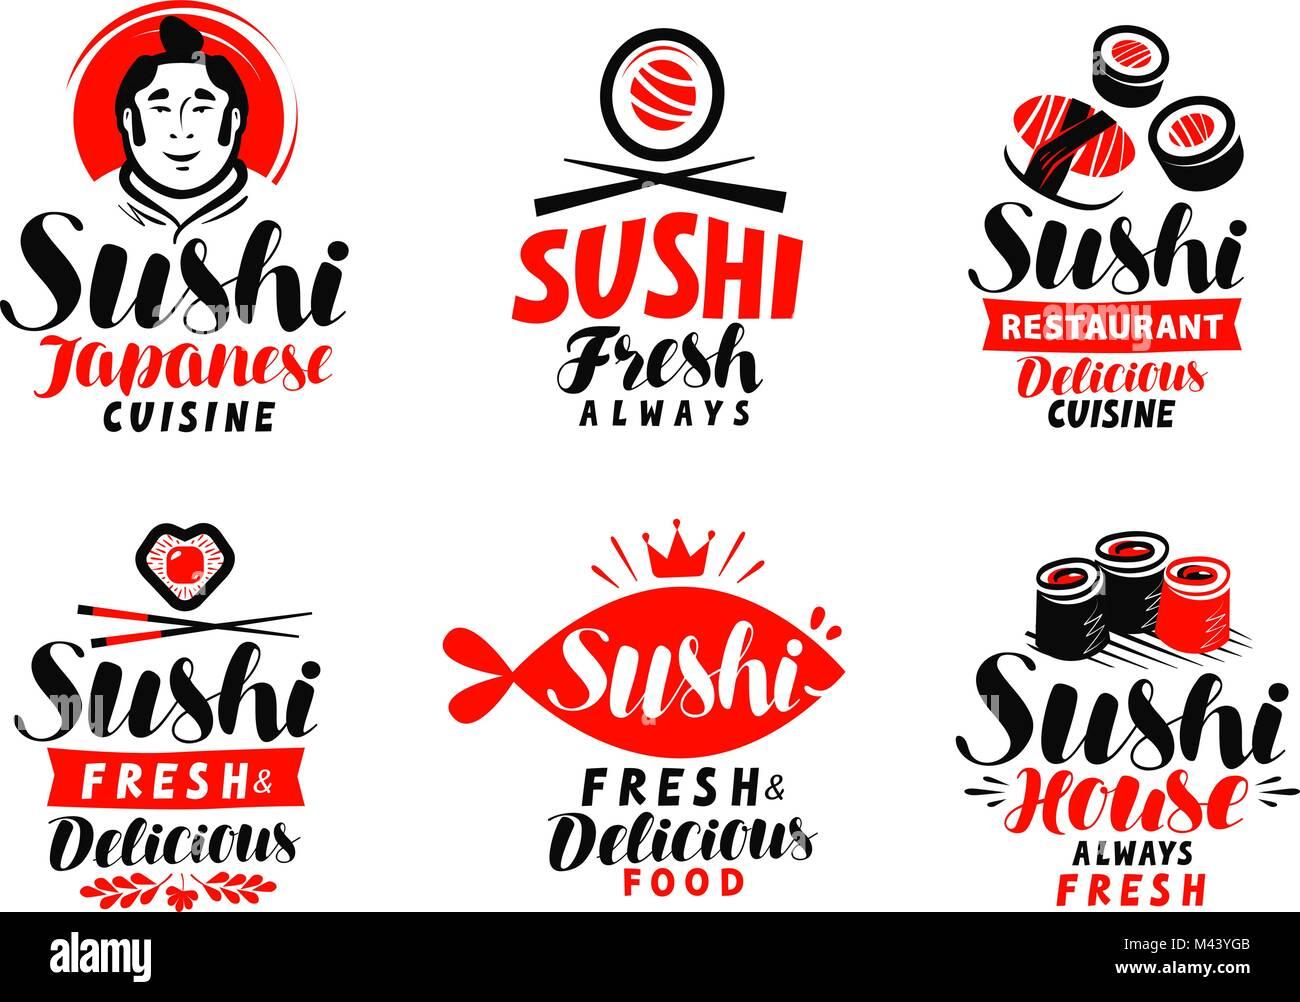 Sushi Japanese Cuisine Logo Or Label Set Of Elements For Restaurant Stock Vector Image Art Alamy